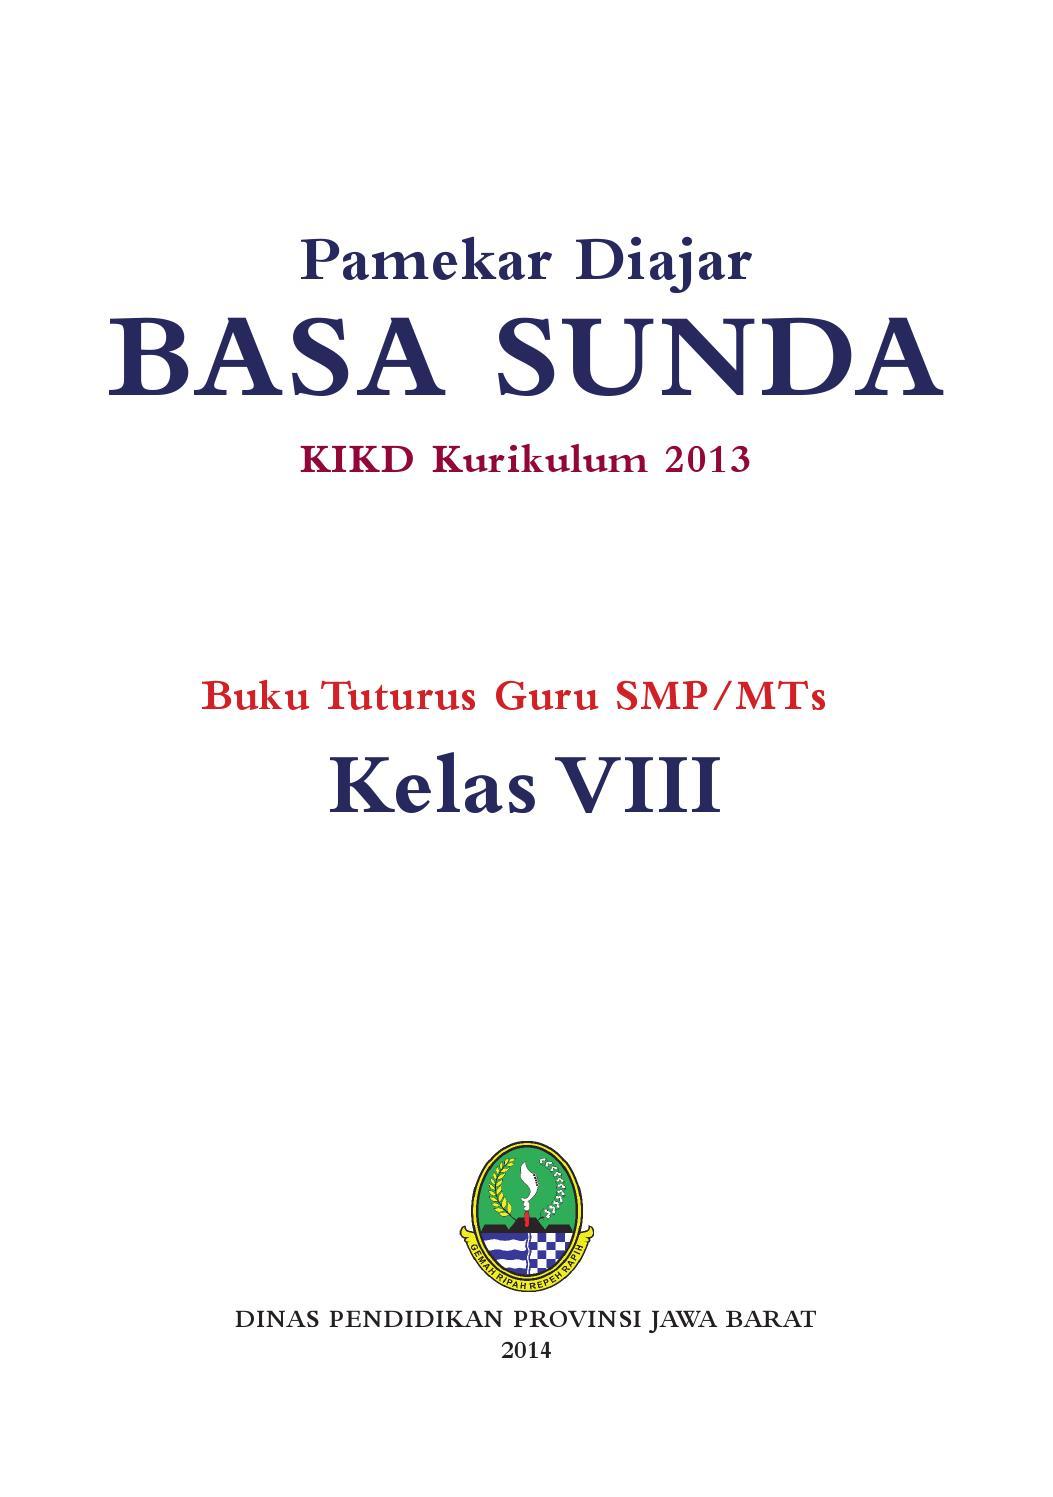 Kelas 08 Smp Basa Sunda Guru By P E Thea Issuu